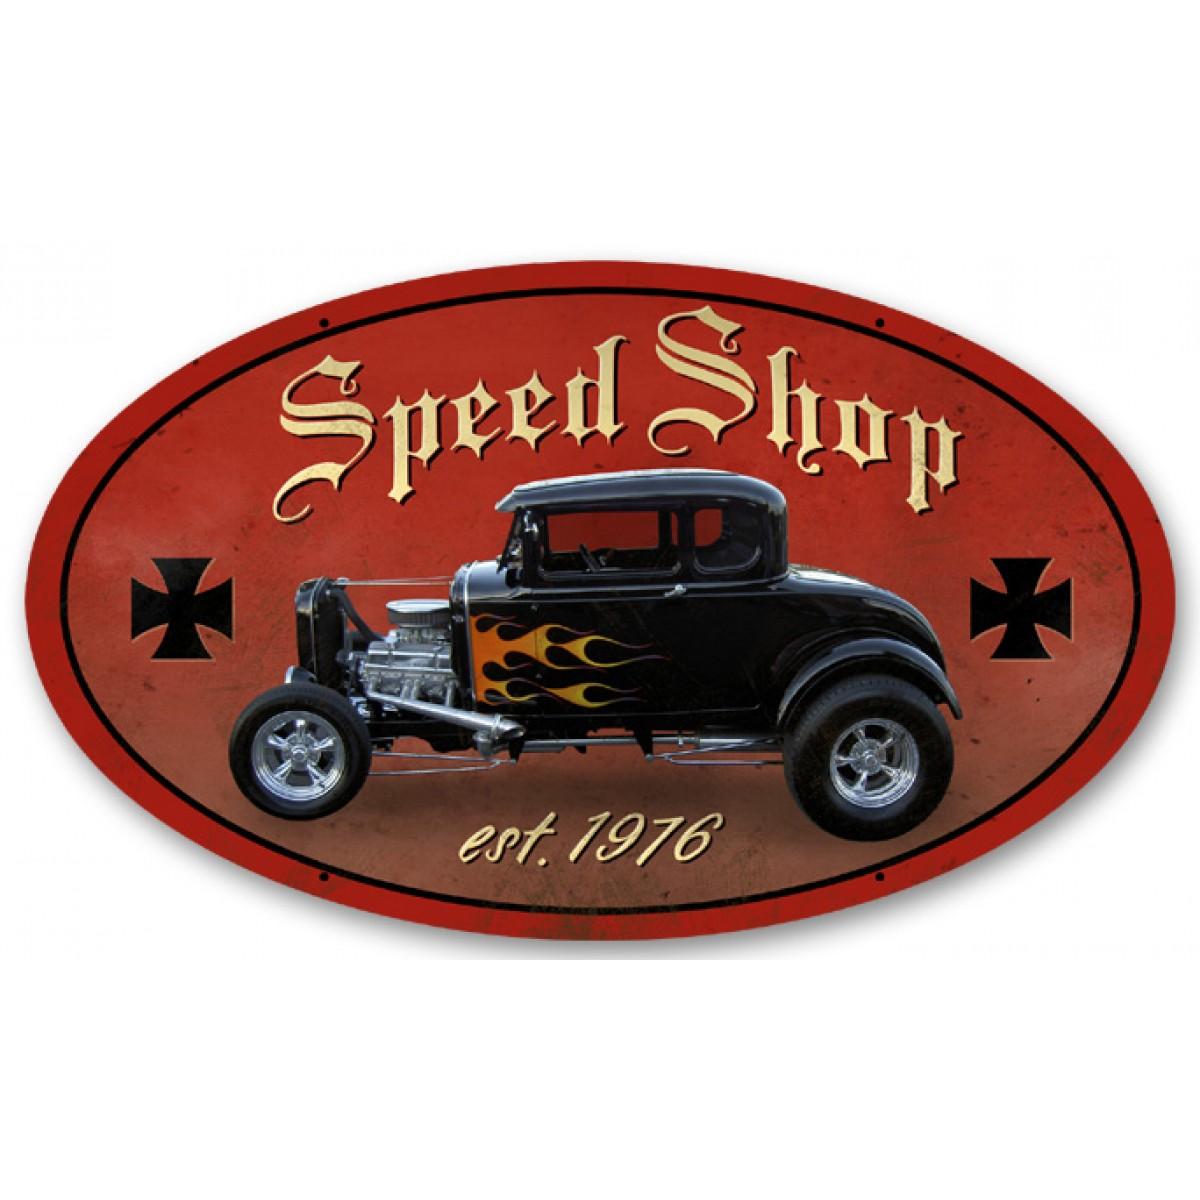 Speed Shop - Hot Rod Garage - Metal Signs